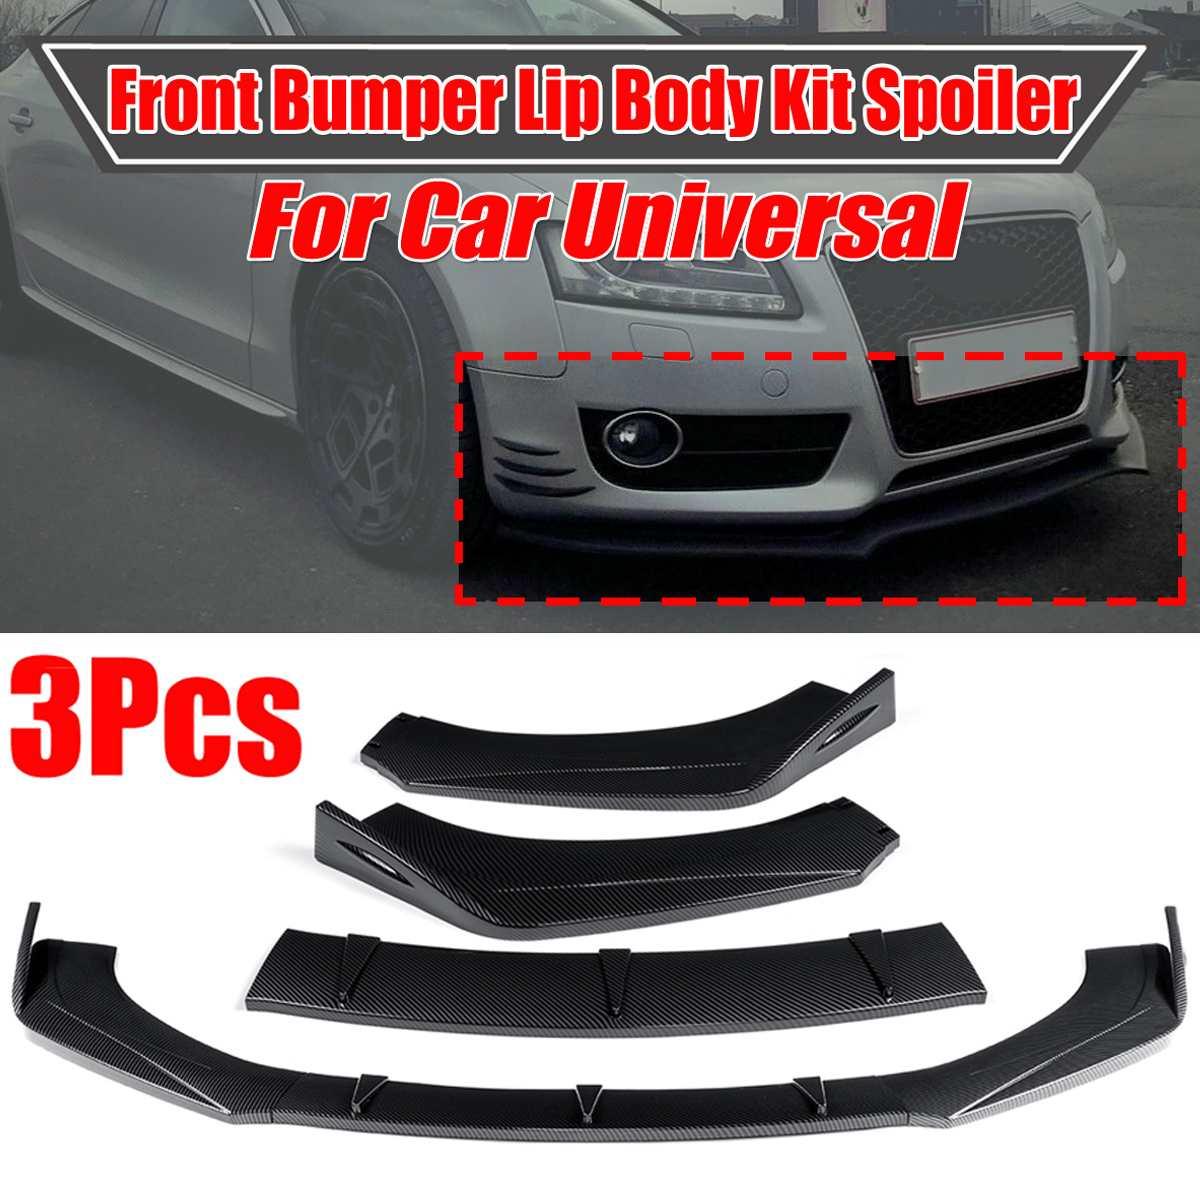 Nuevo Universal coche parachoques delantero divisor labio cuerpo Kit Spoiler difusor para Audi A5 Sline S5 RS5 09-16 para BMW para Benz para Mazad